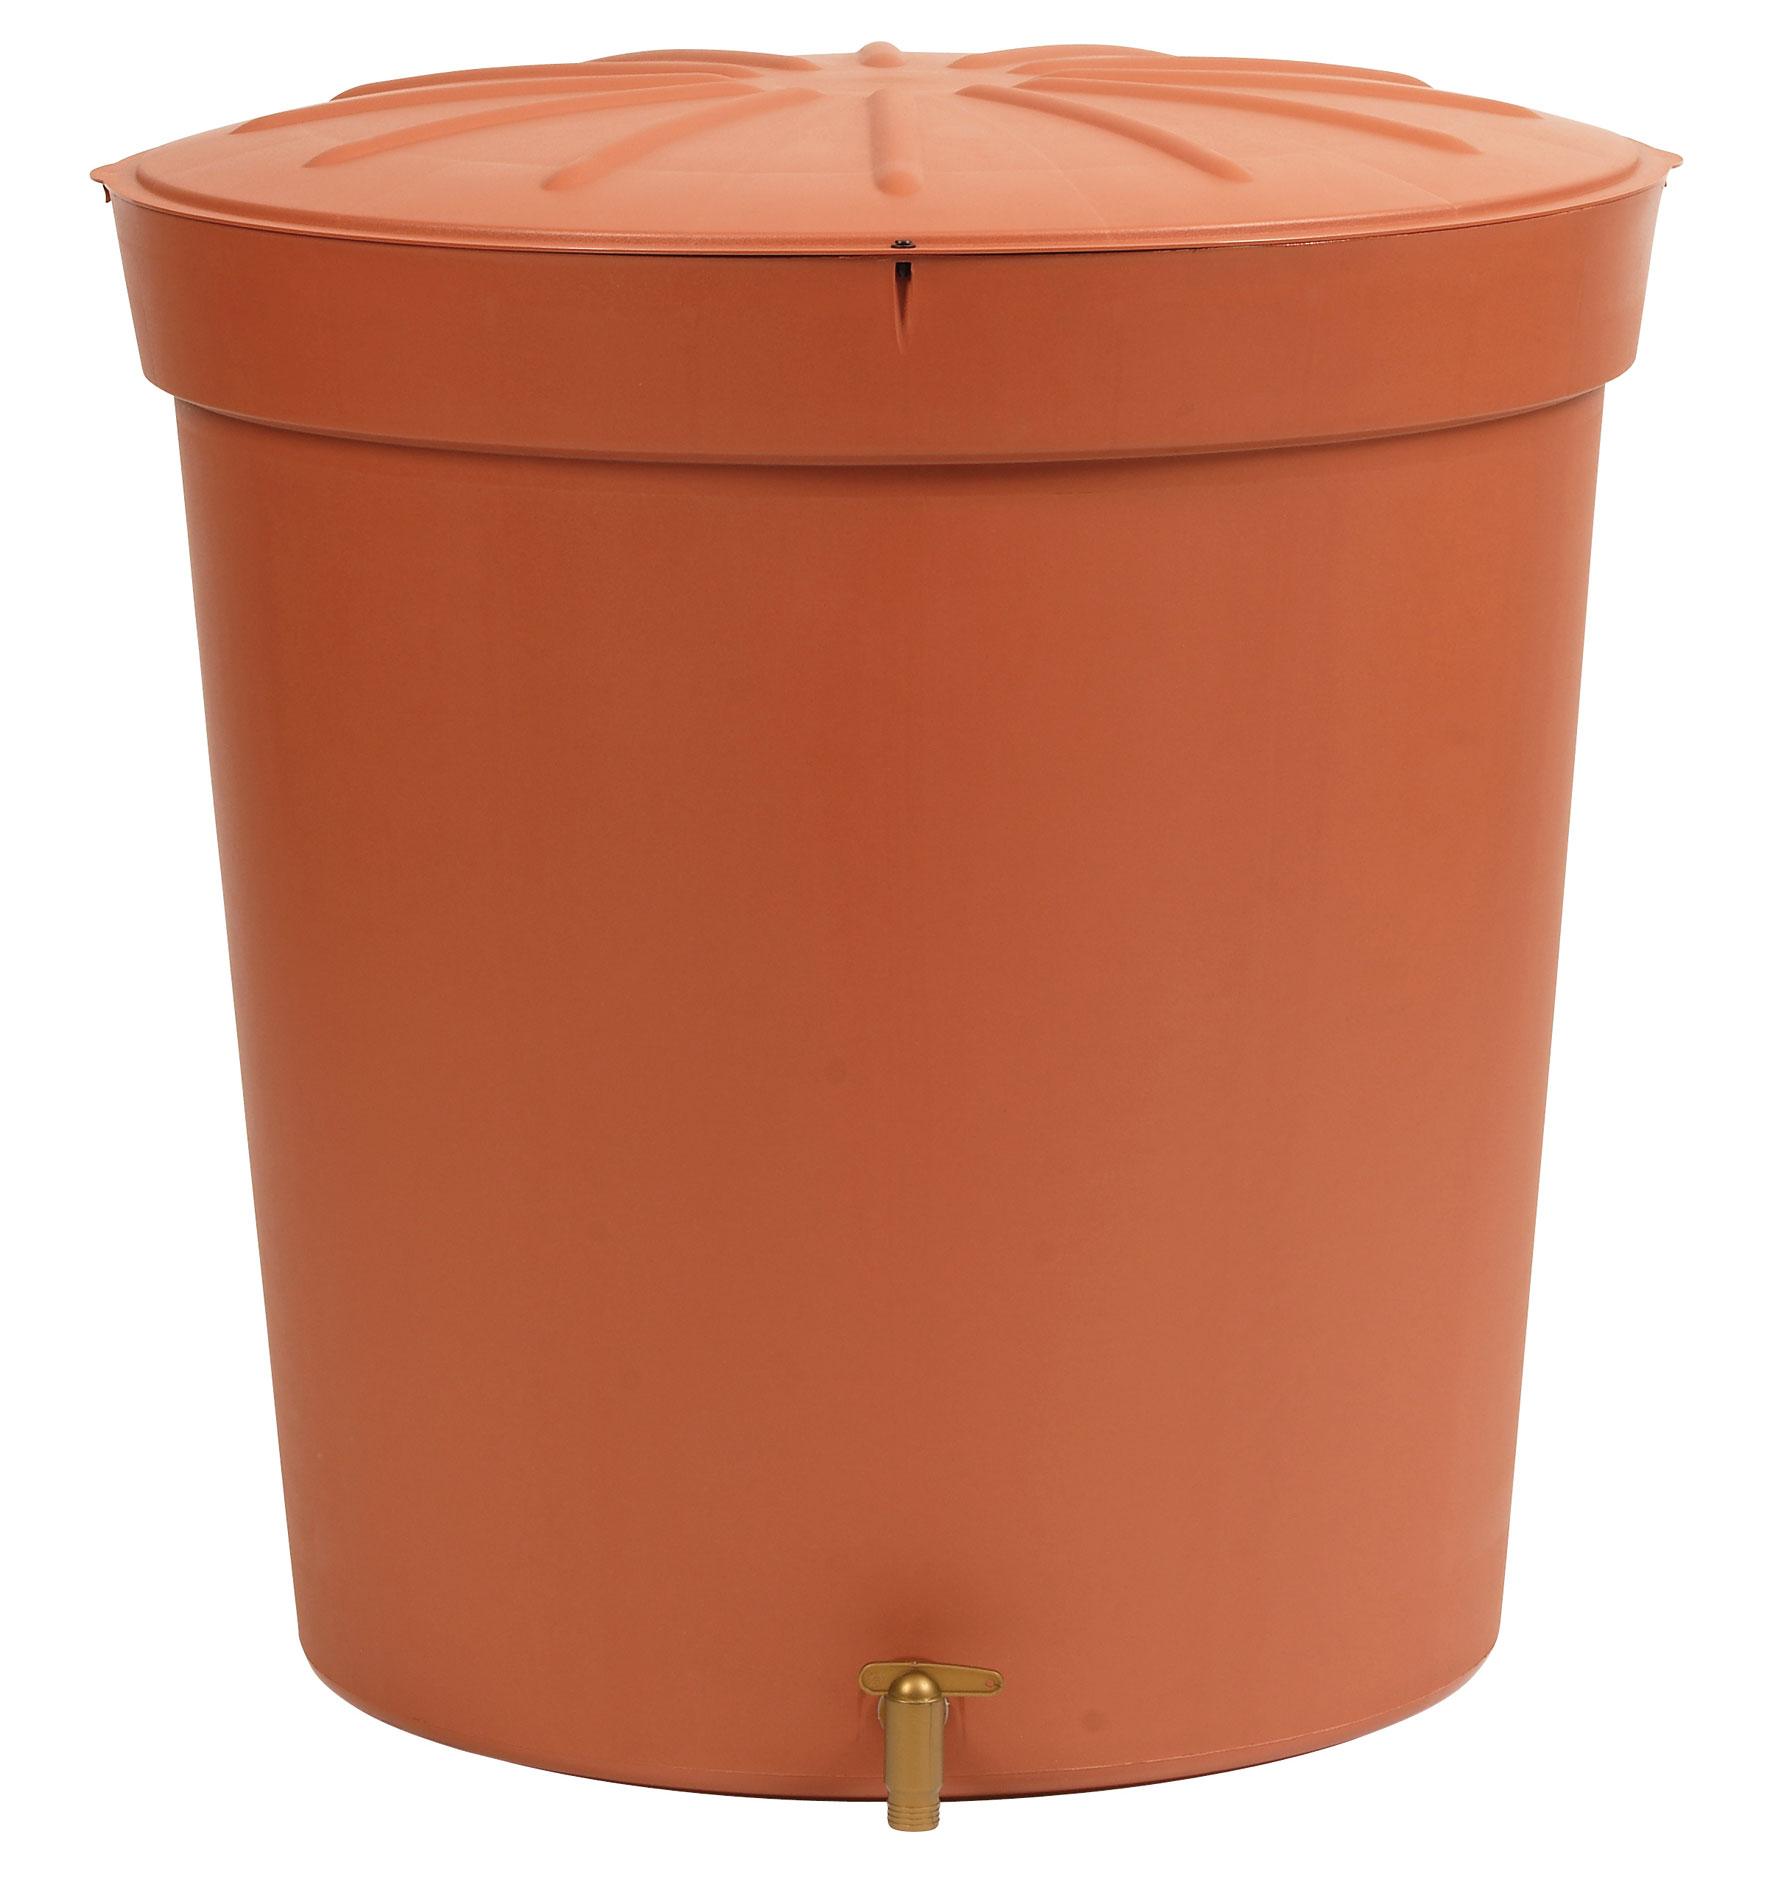 regentonne toskana 300 liter rund terrakotta garantia bei. Black Bedroom Furniture Sets. Home Design Ideas